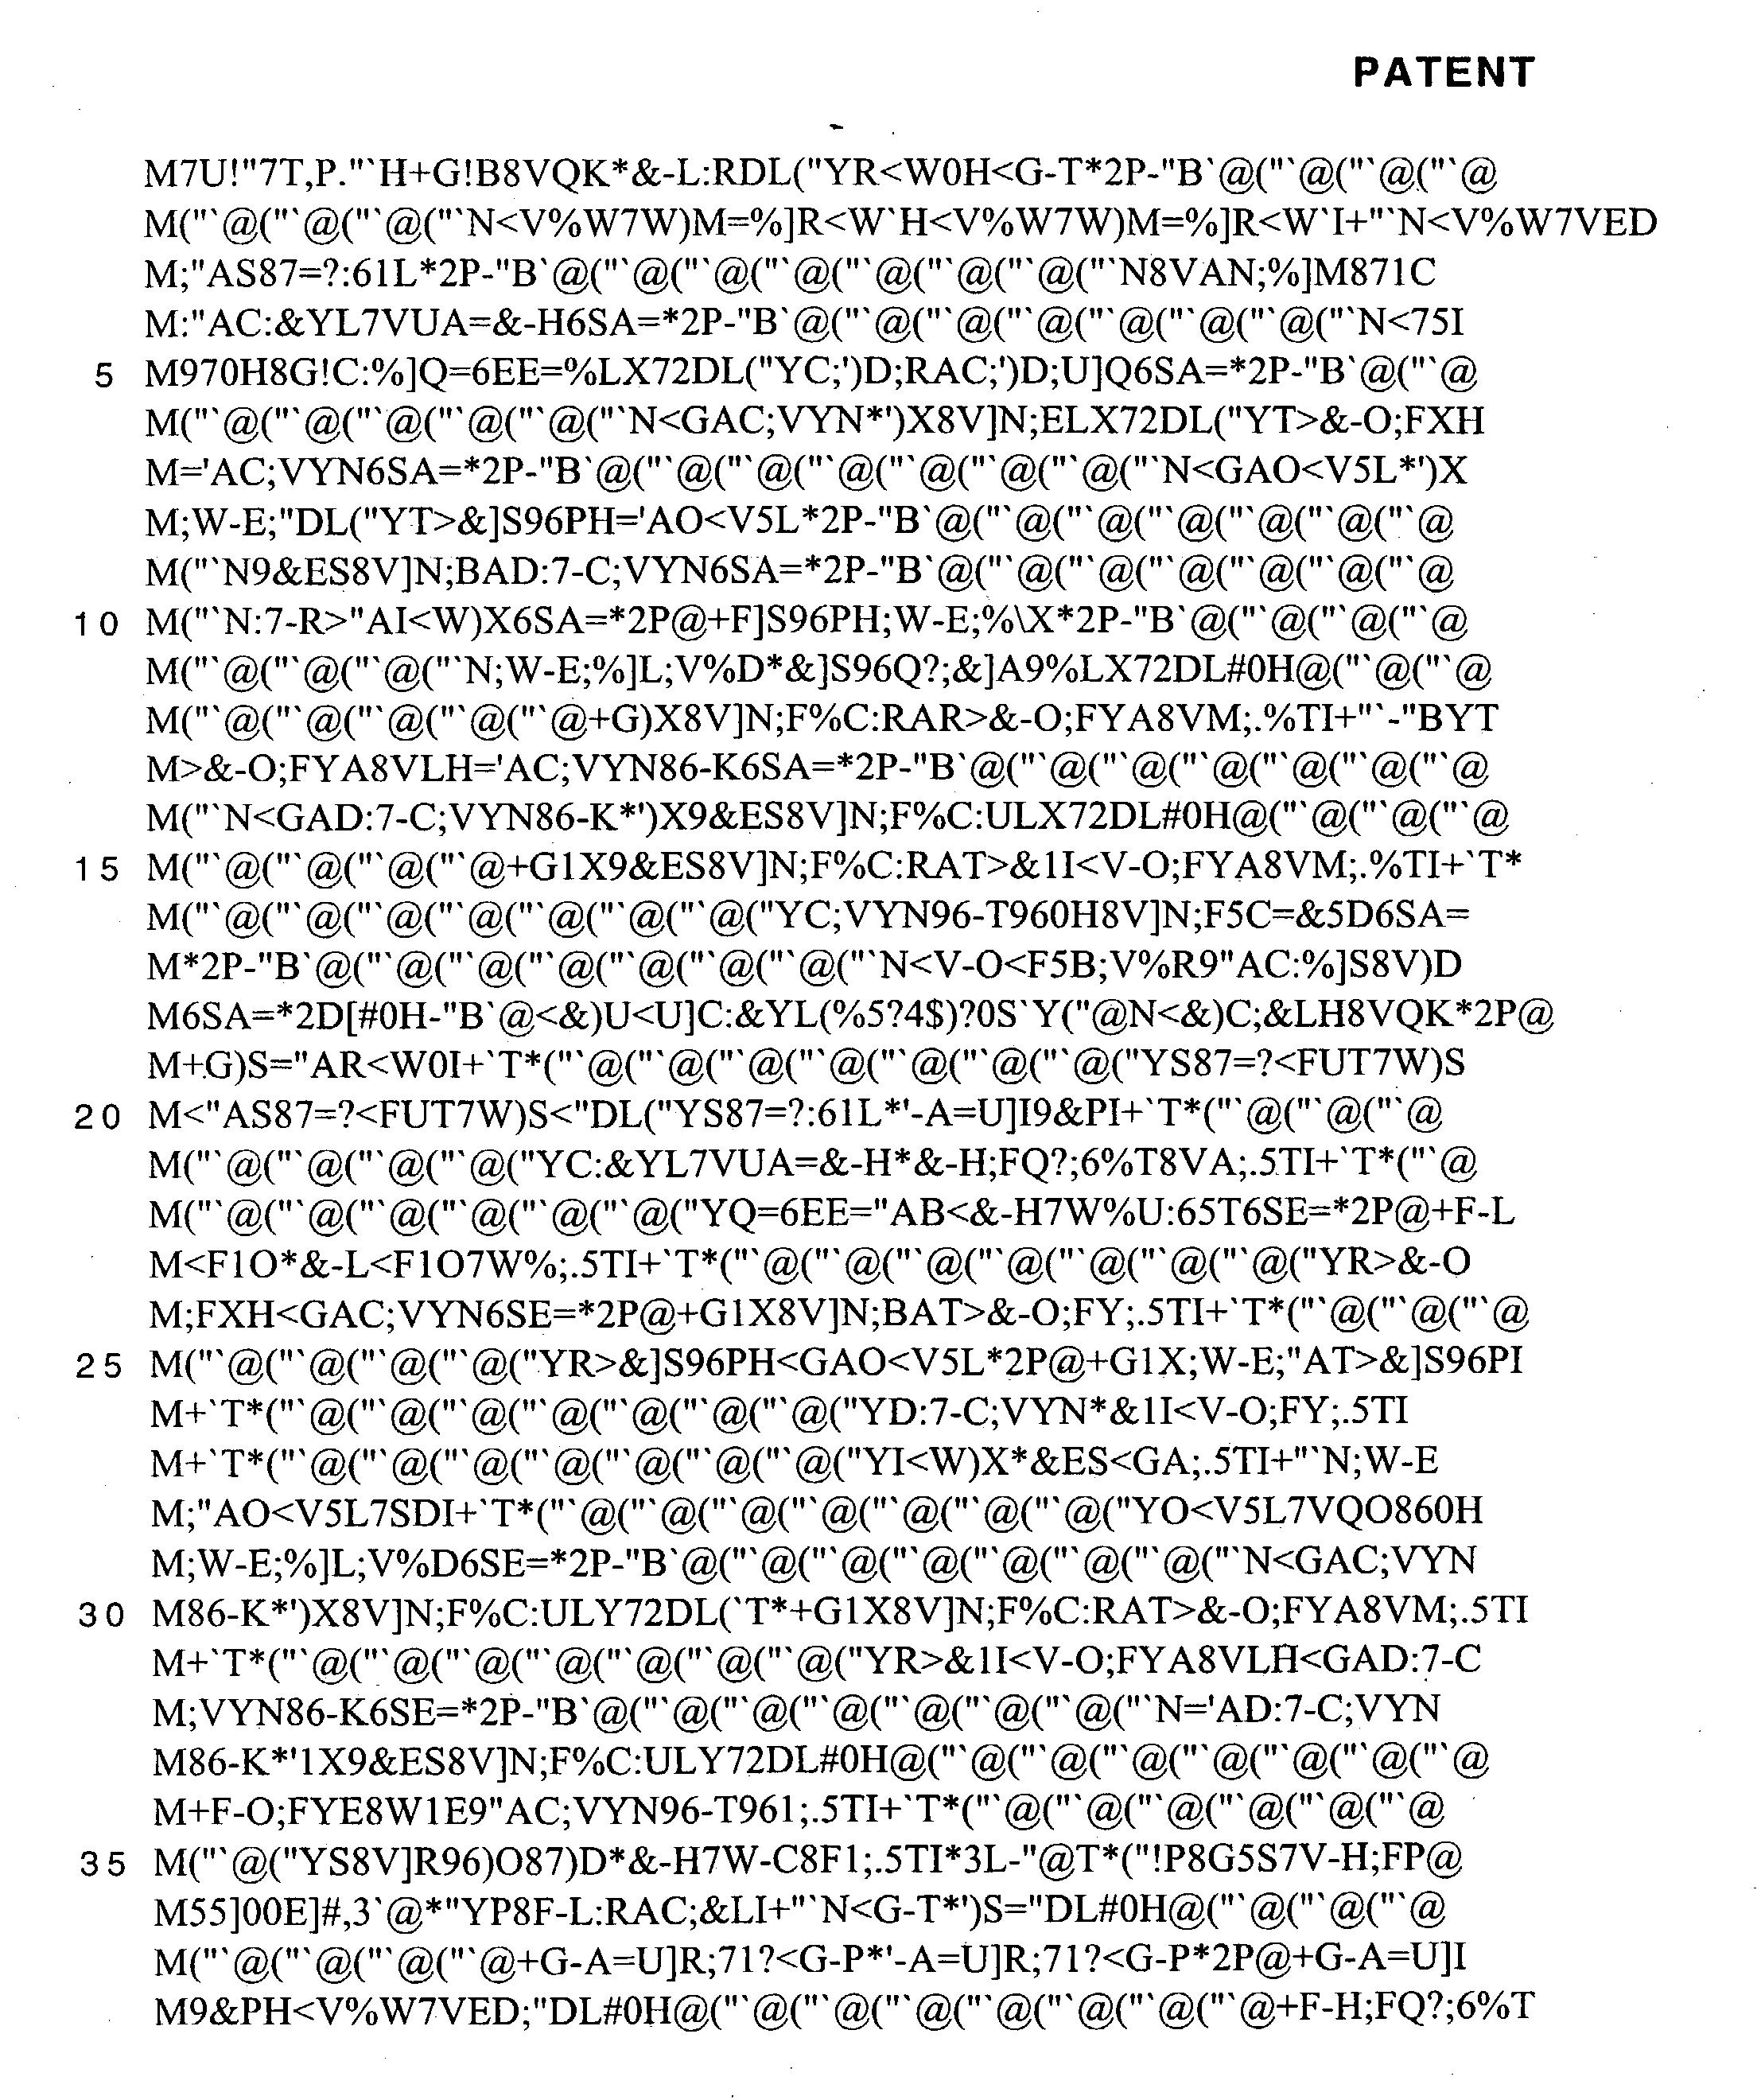 Figure US20030174720A1-20030918-P00079